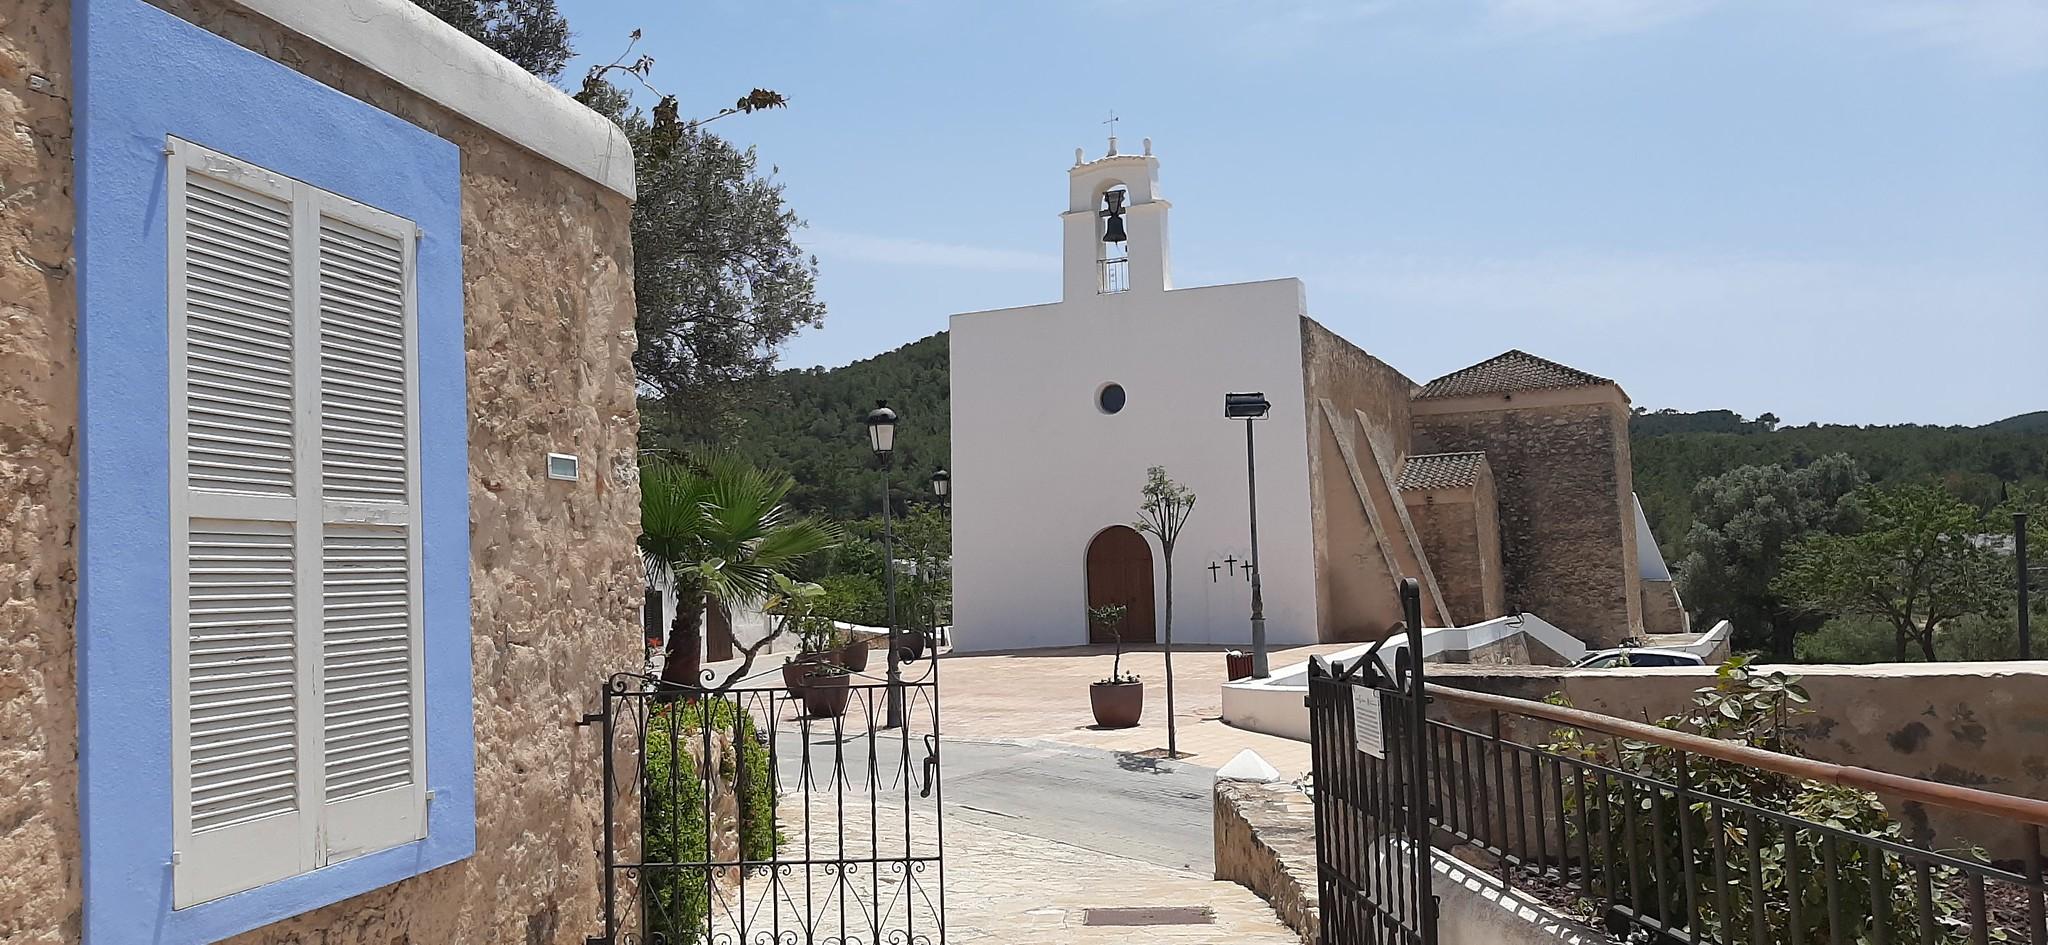 Sant Agustín des Vedrà, Ibiza, 26 de mayo 2021